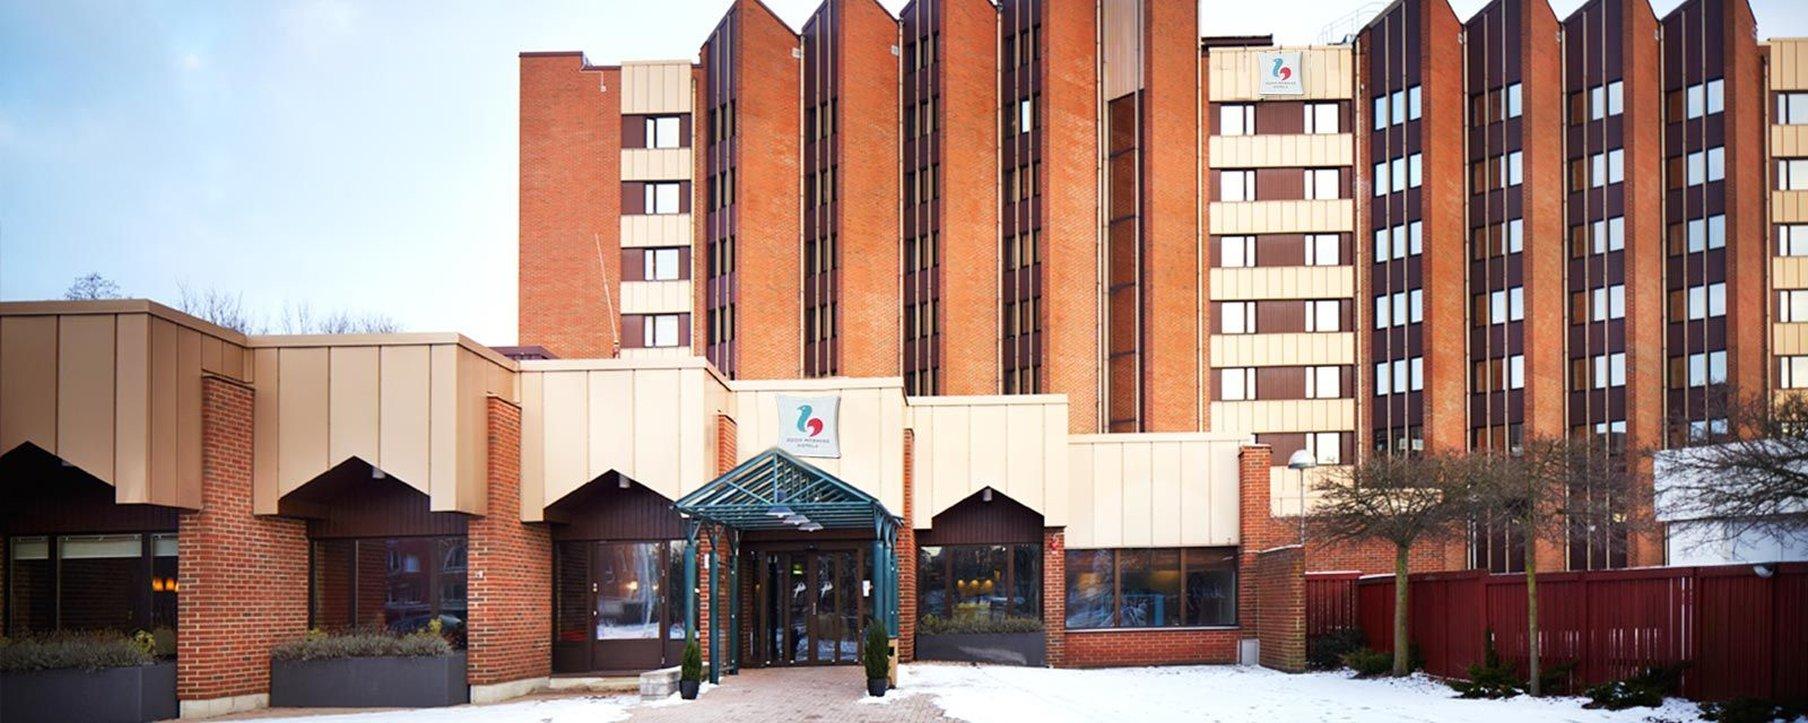 Good Morning Hotel Helsingborg